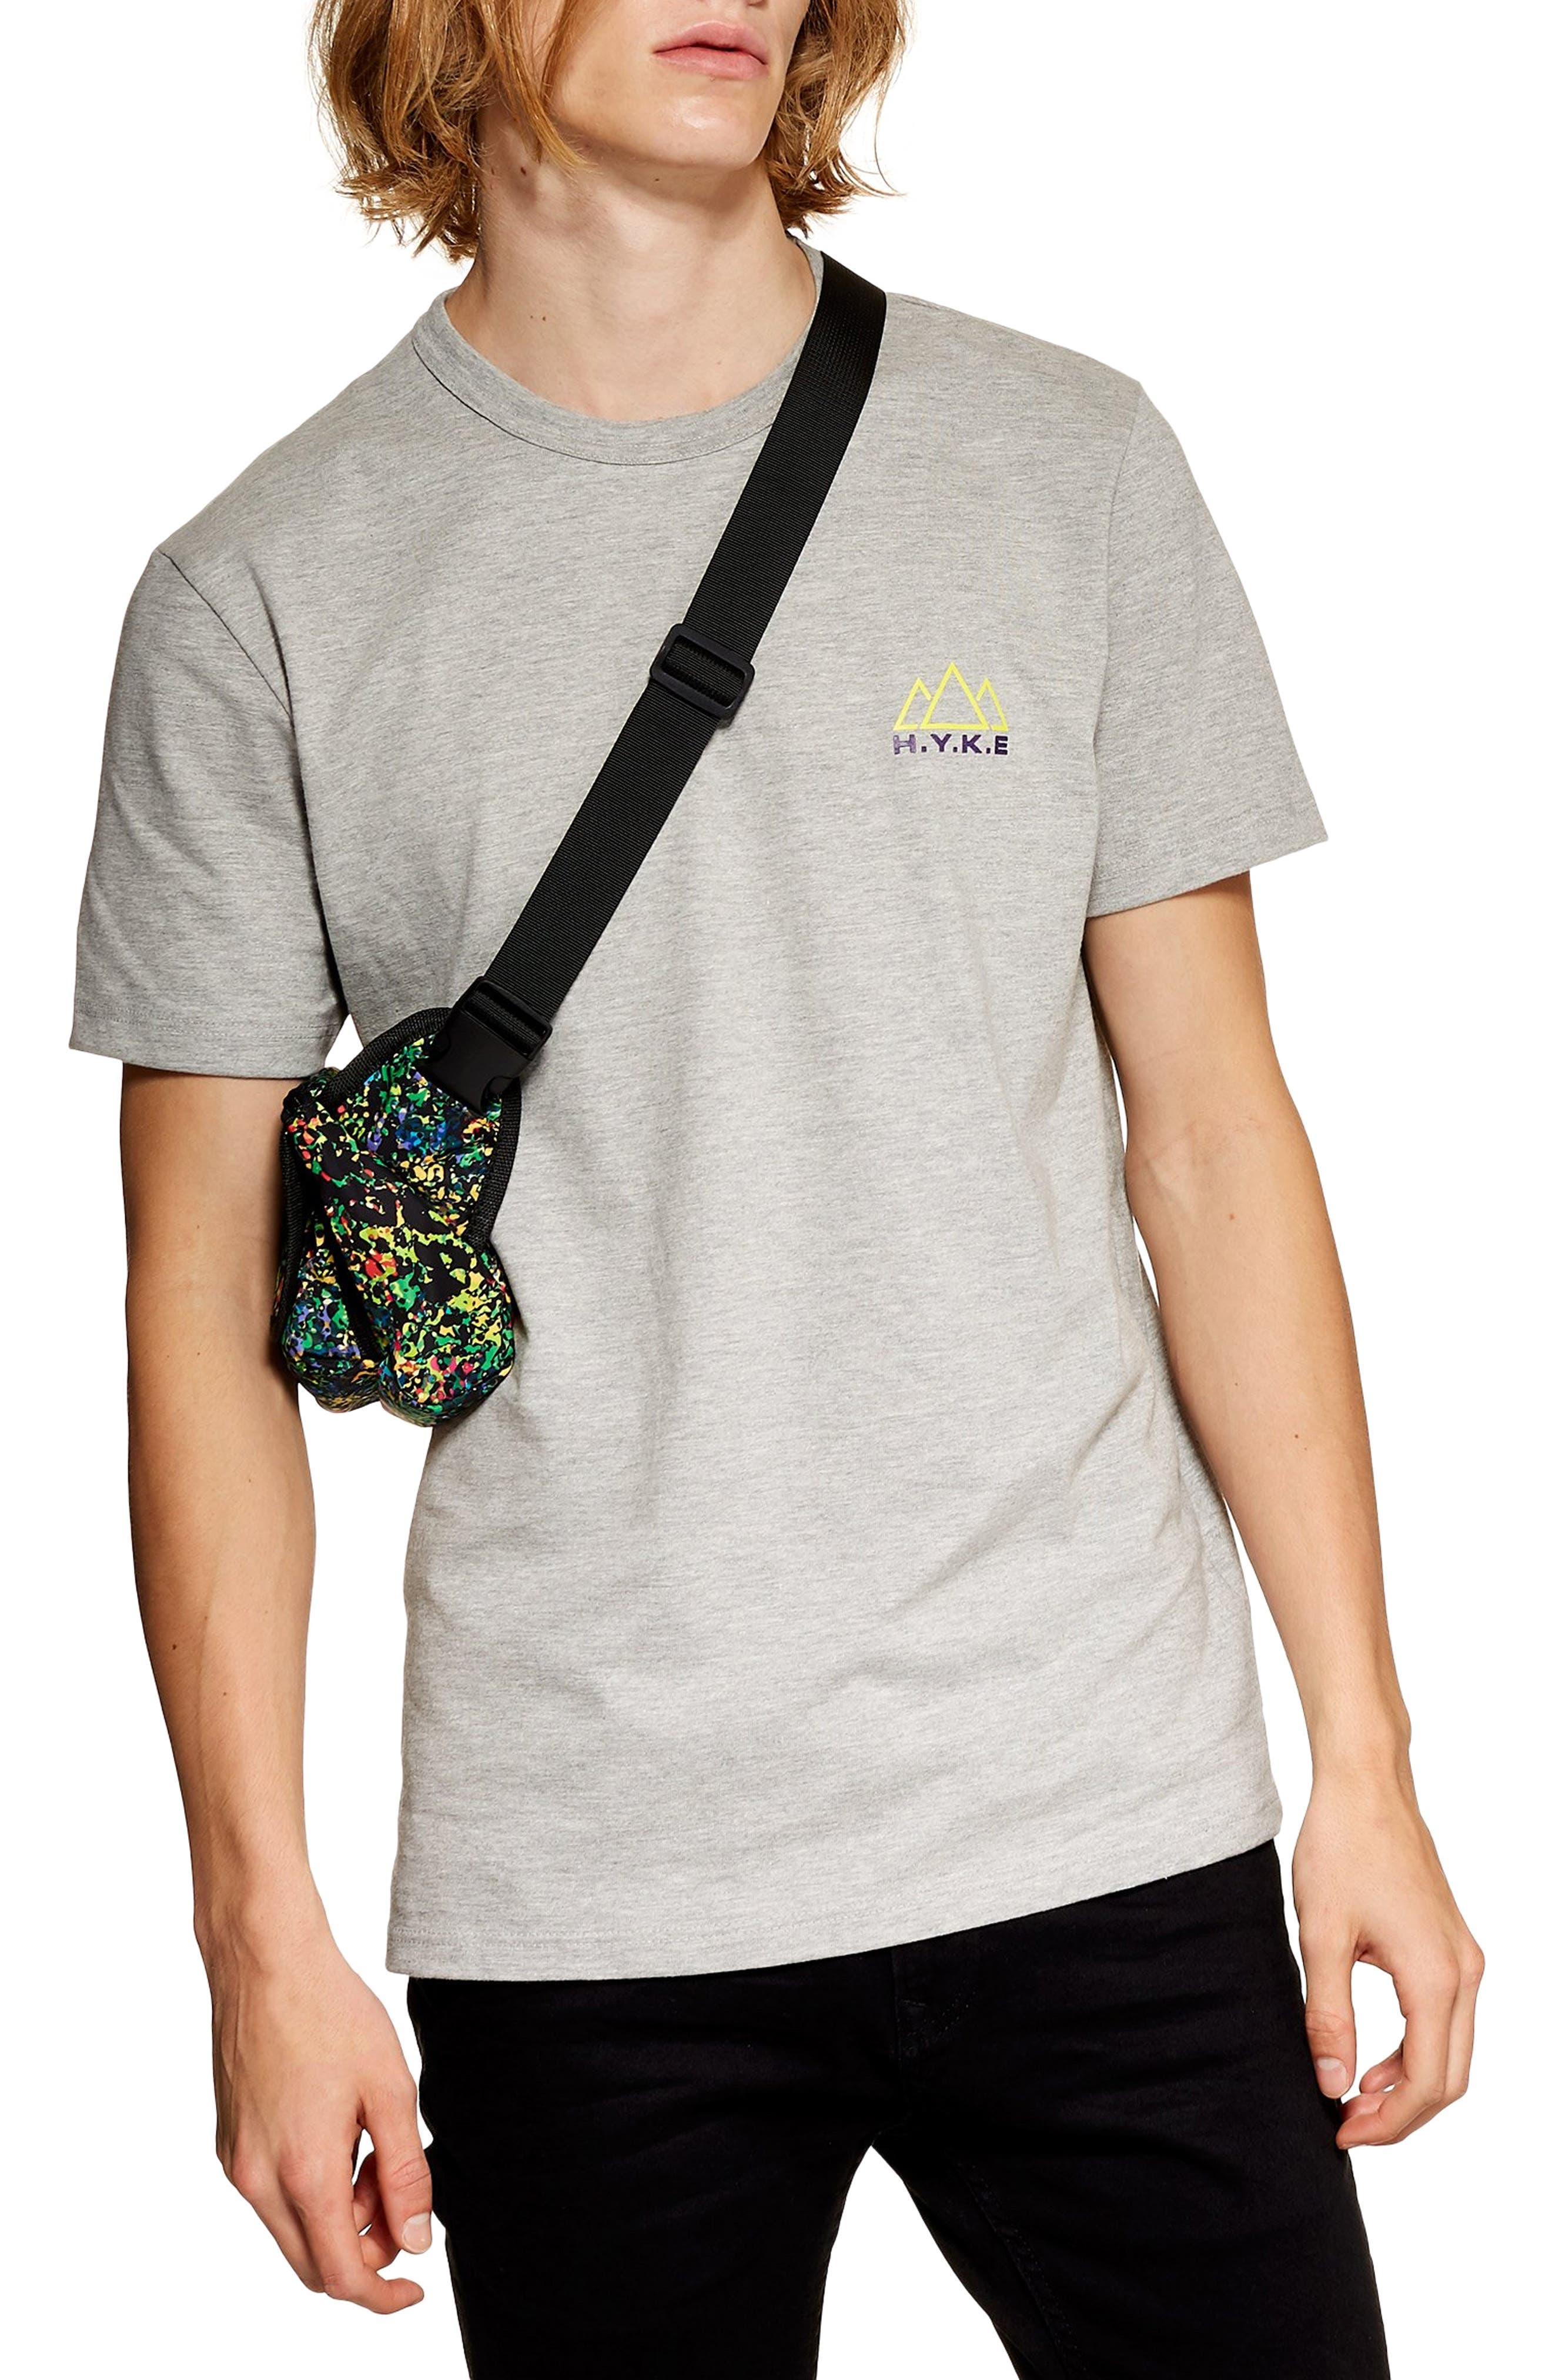 H.Y.K.E. Graphic T-Shirt,                         Main,                         color, GREY